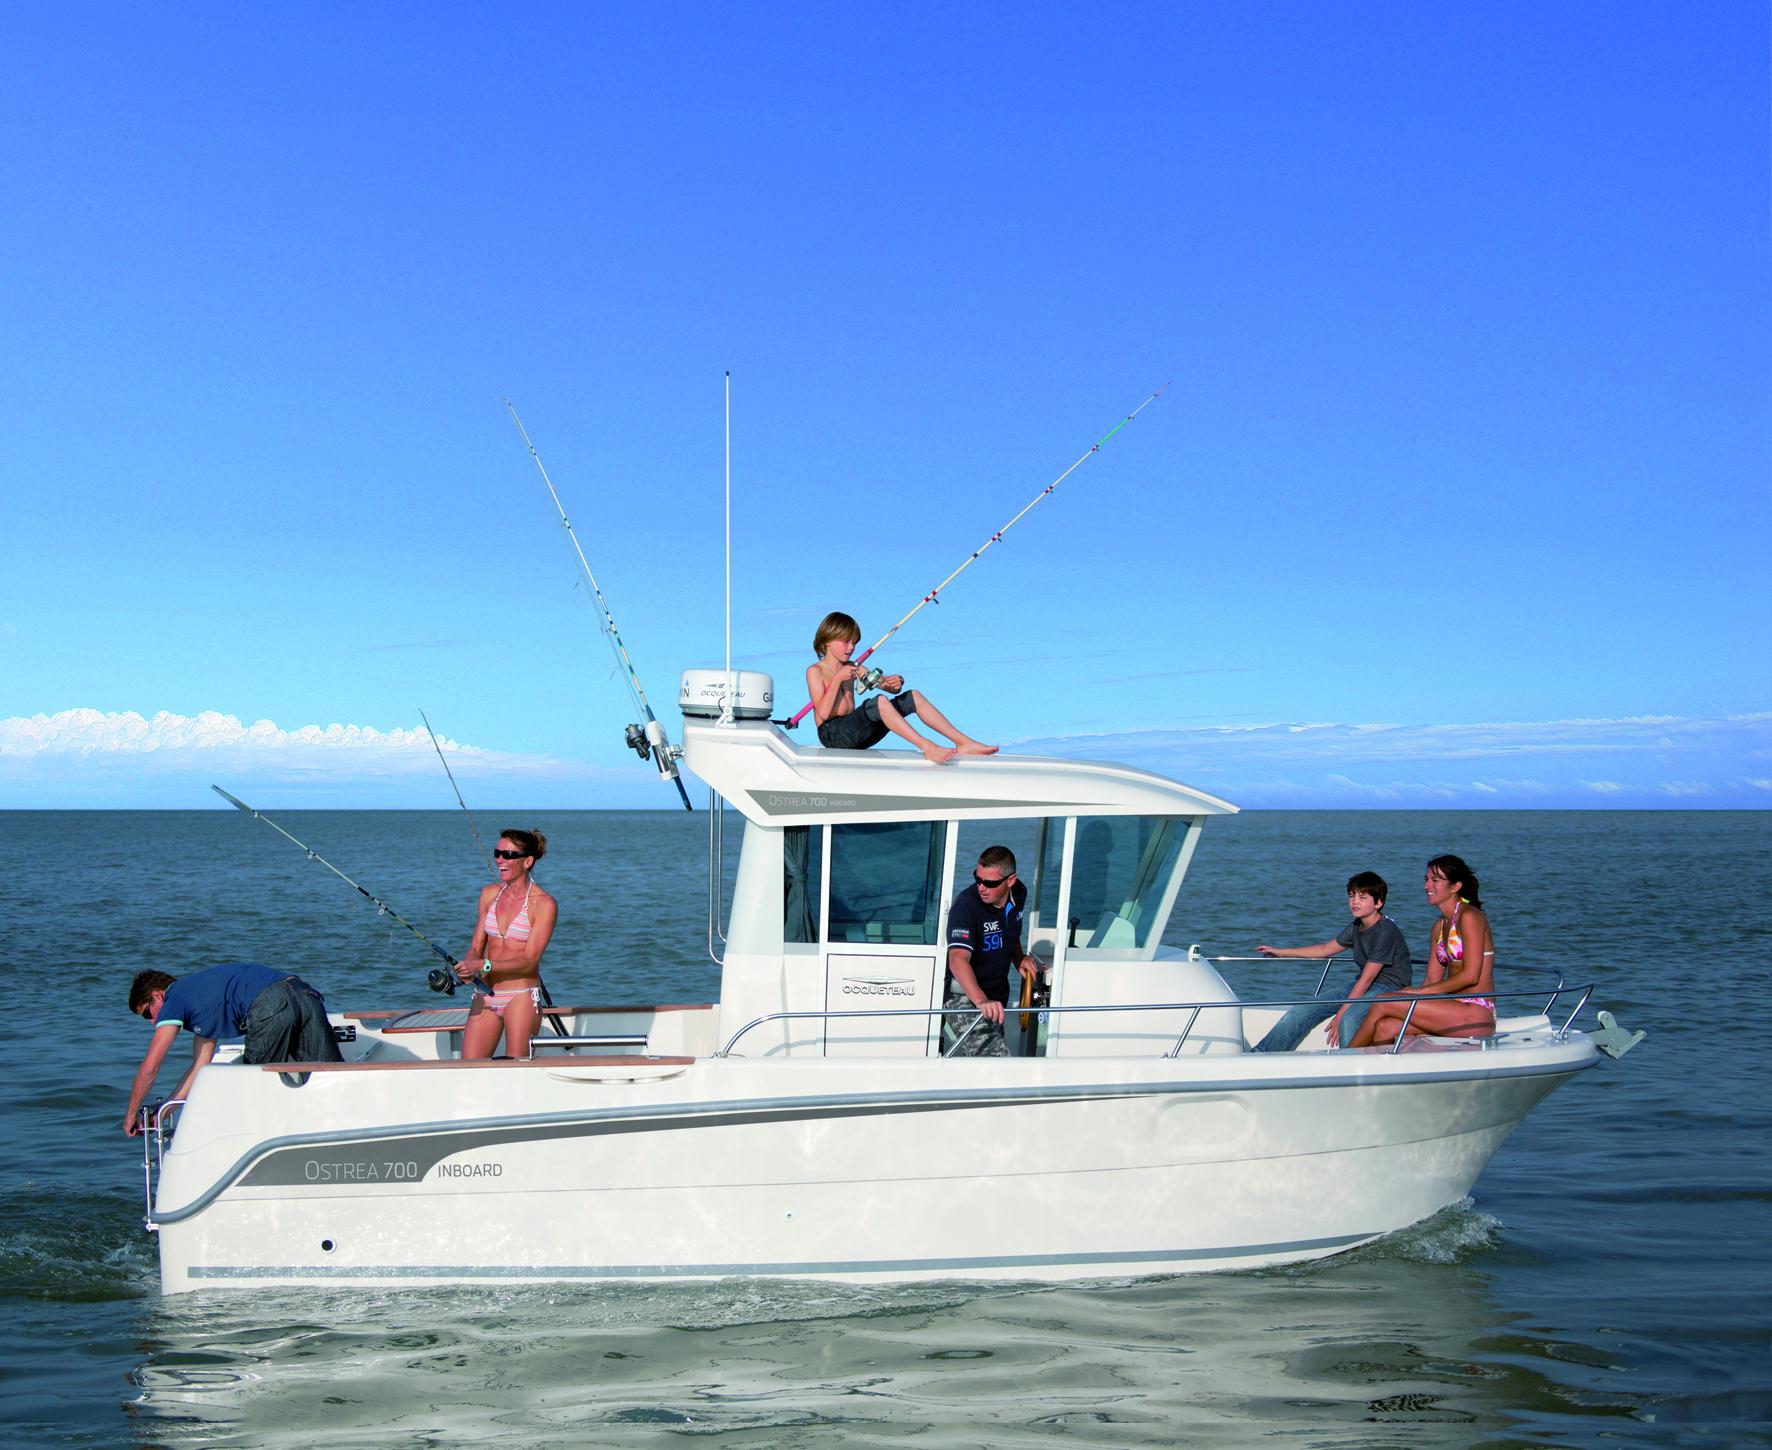 bateau  u00e0 moteur ocqueteau ostrea 700 inboard - notre gamme